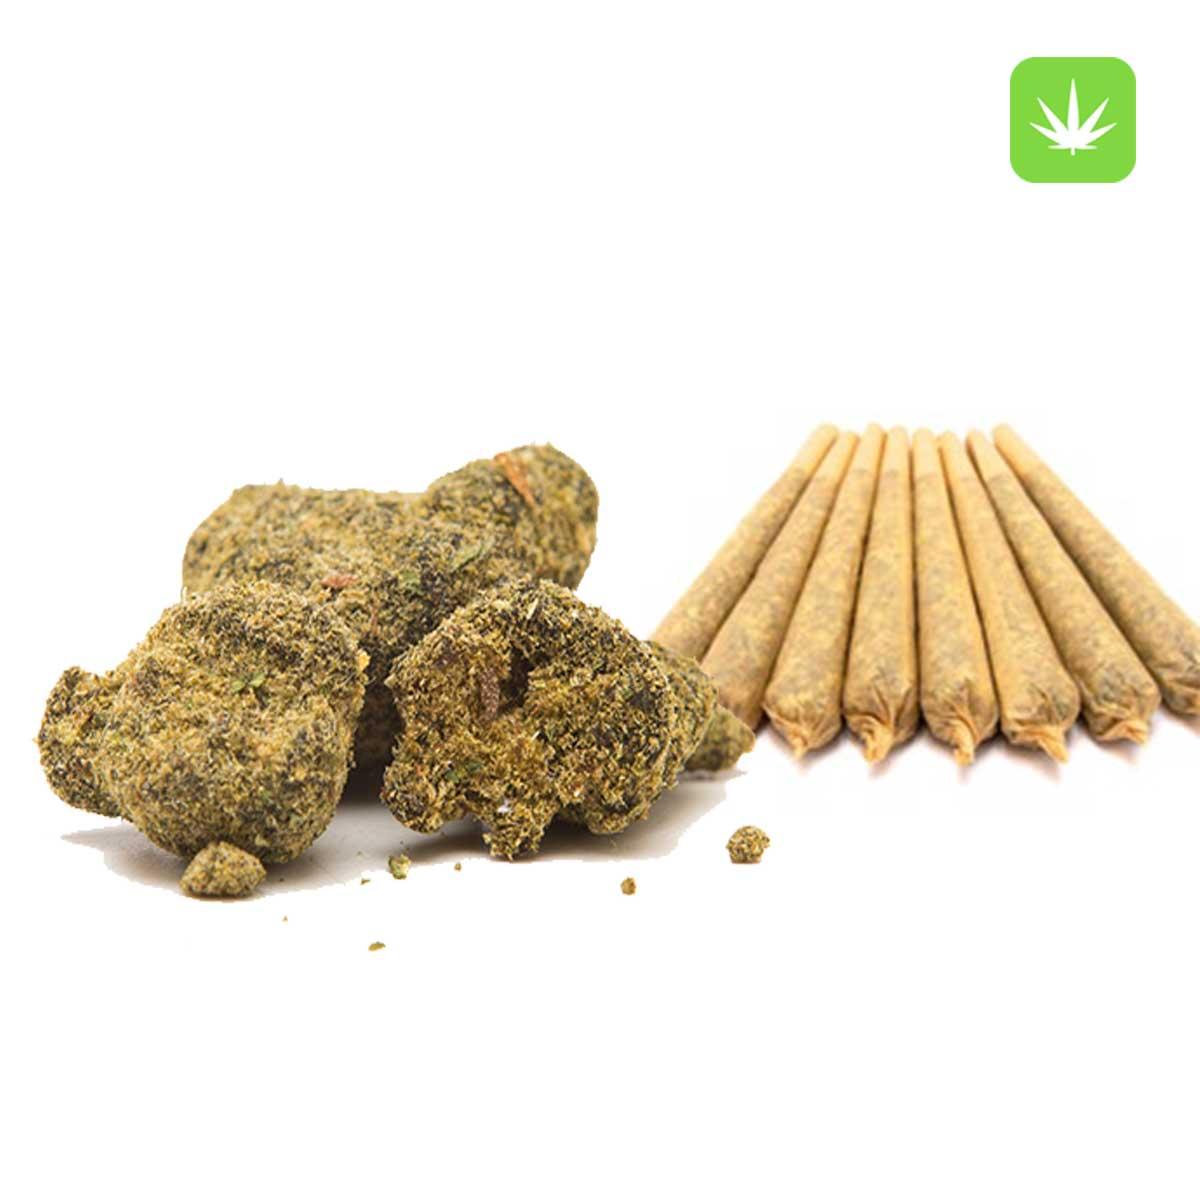 MOON ROCK PRE ROLLED BLUNT Cannabis Avenue